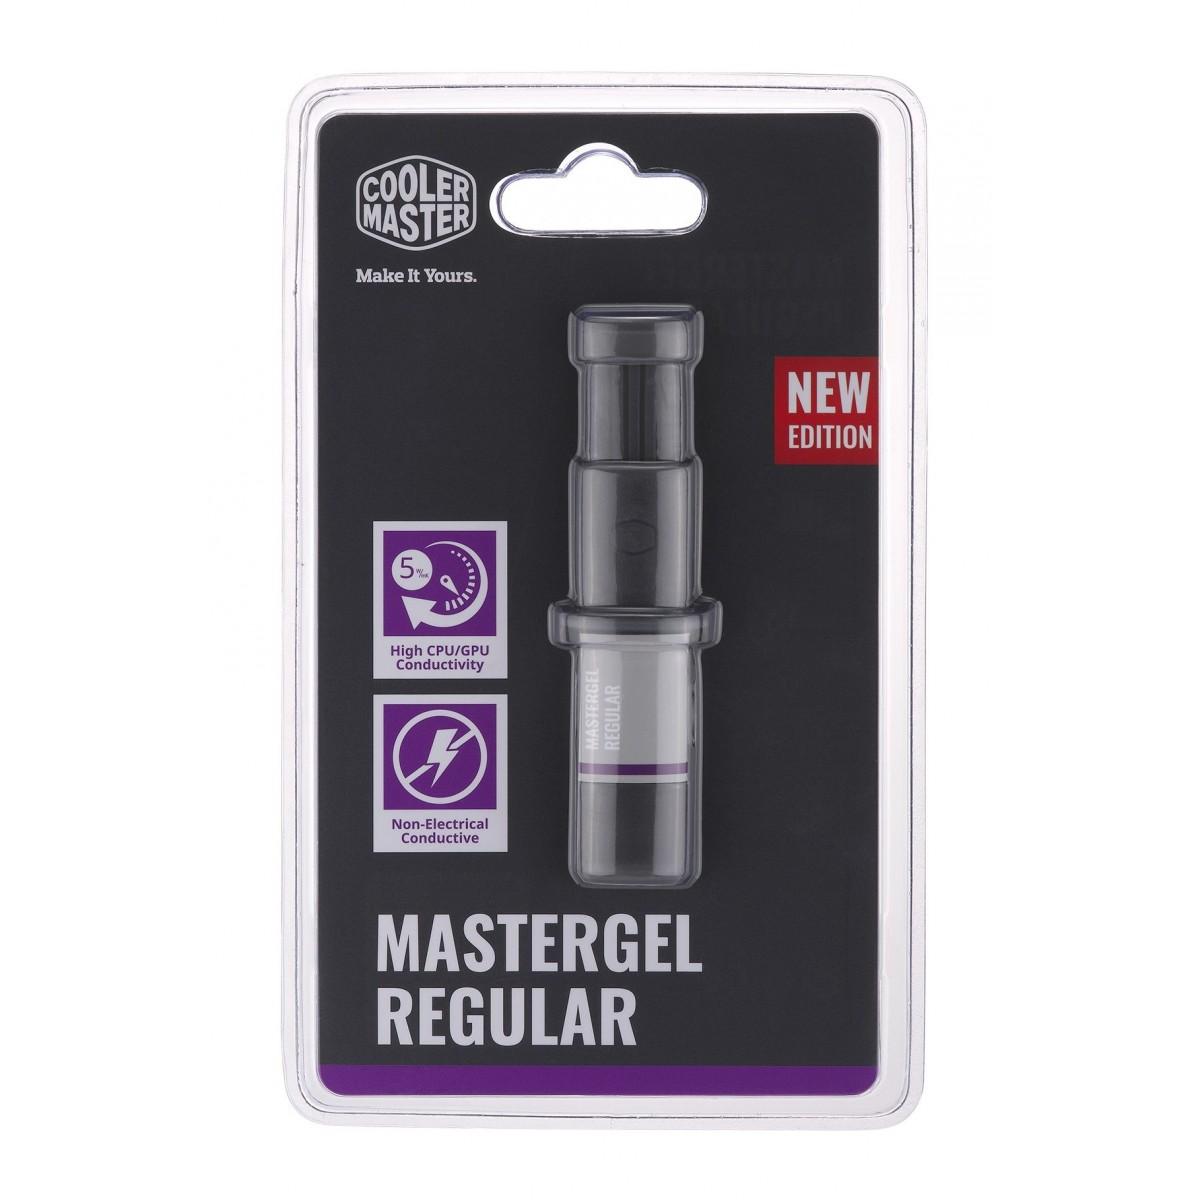 Pasta Térmica Cooler Master Mastergel Regular, 1.5ML, Cinza - MGX-ZOSG-N15M-R2